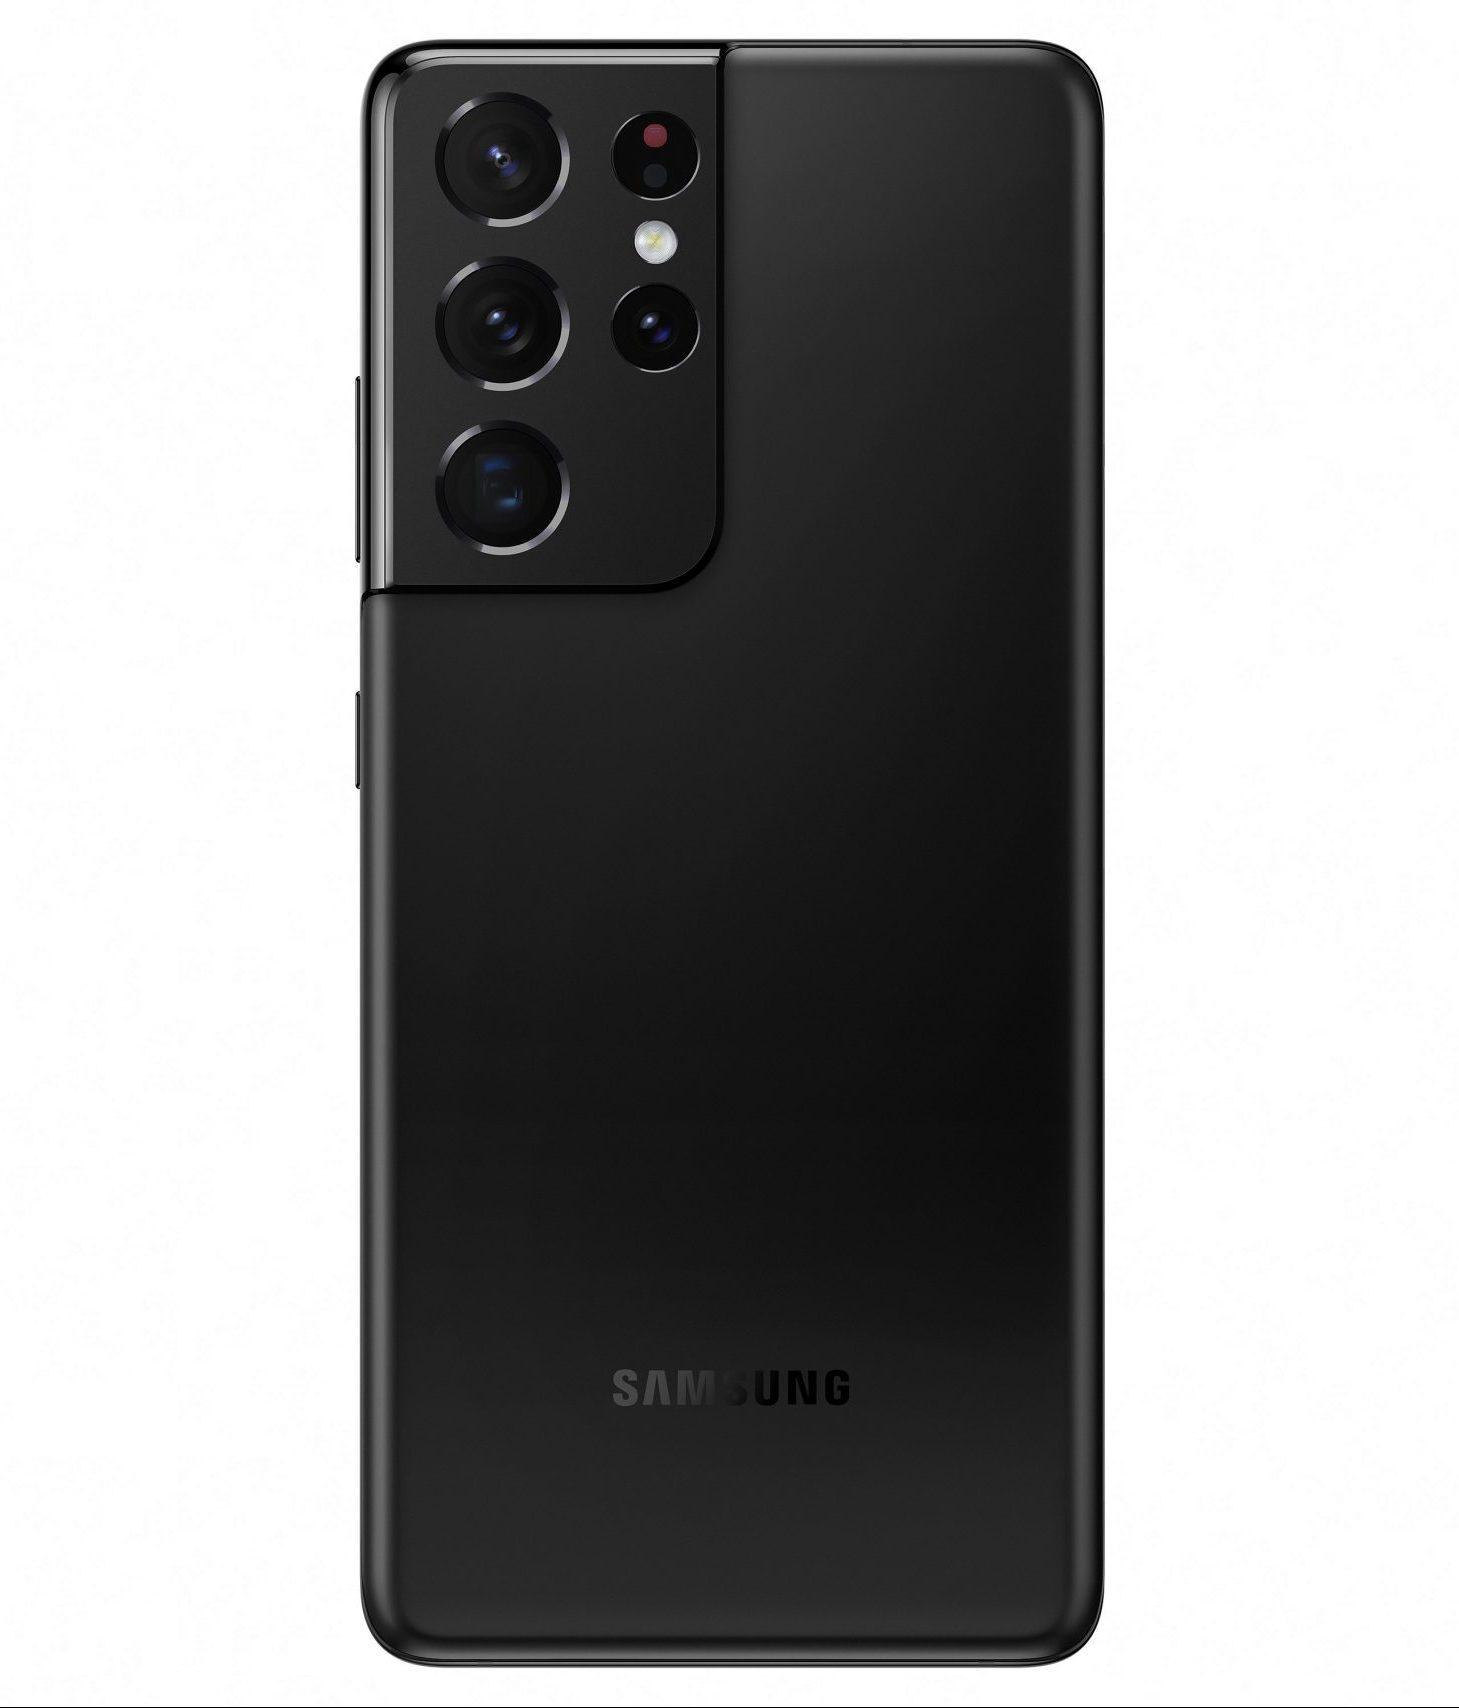 Samsung Galaxy S21 Ultra 5G - www.vodafone.co (3)